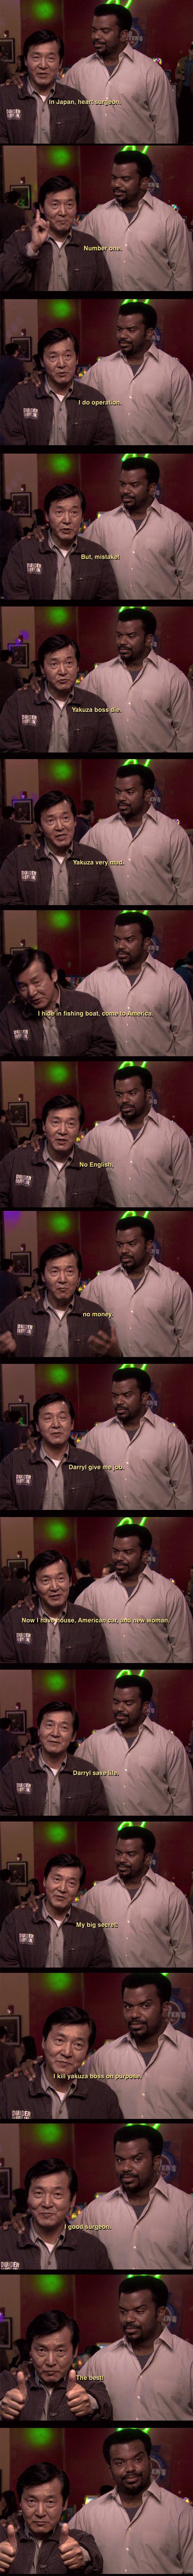 cool-Office-Darryl-Japan-heart-surgeon